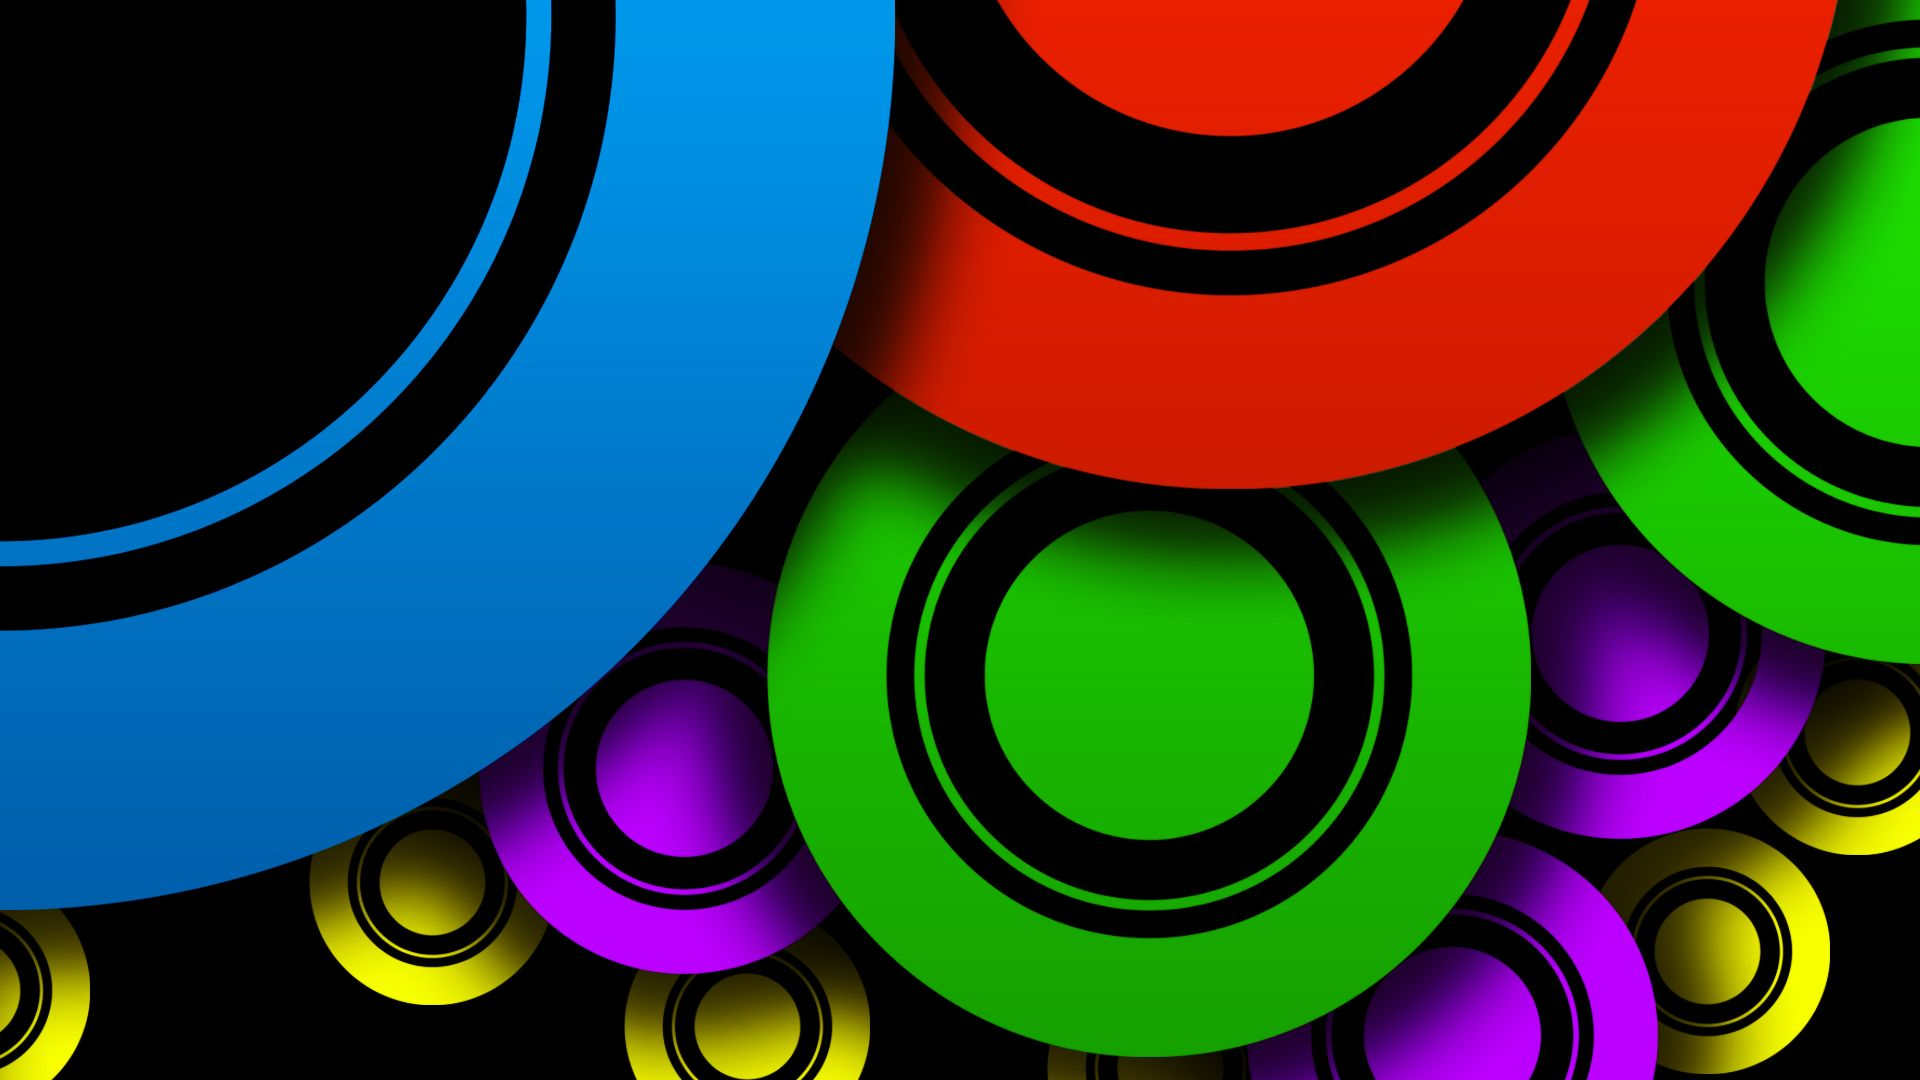 Circle hd wallpaper download